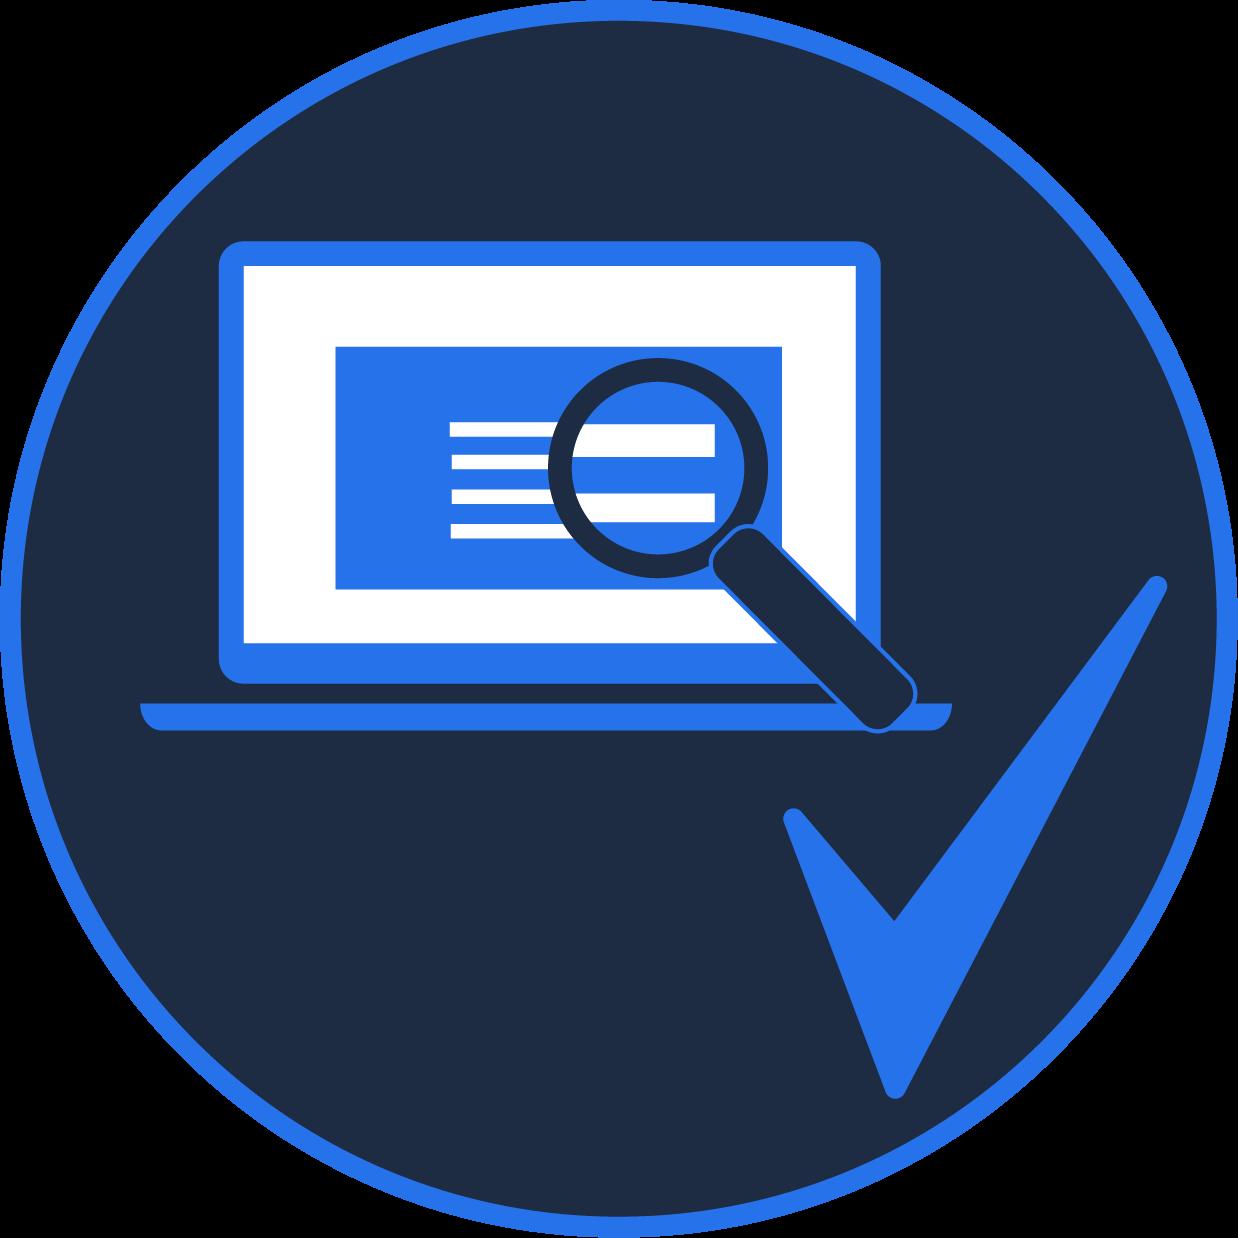 Data protection principles badge